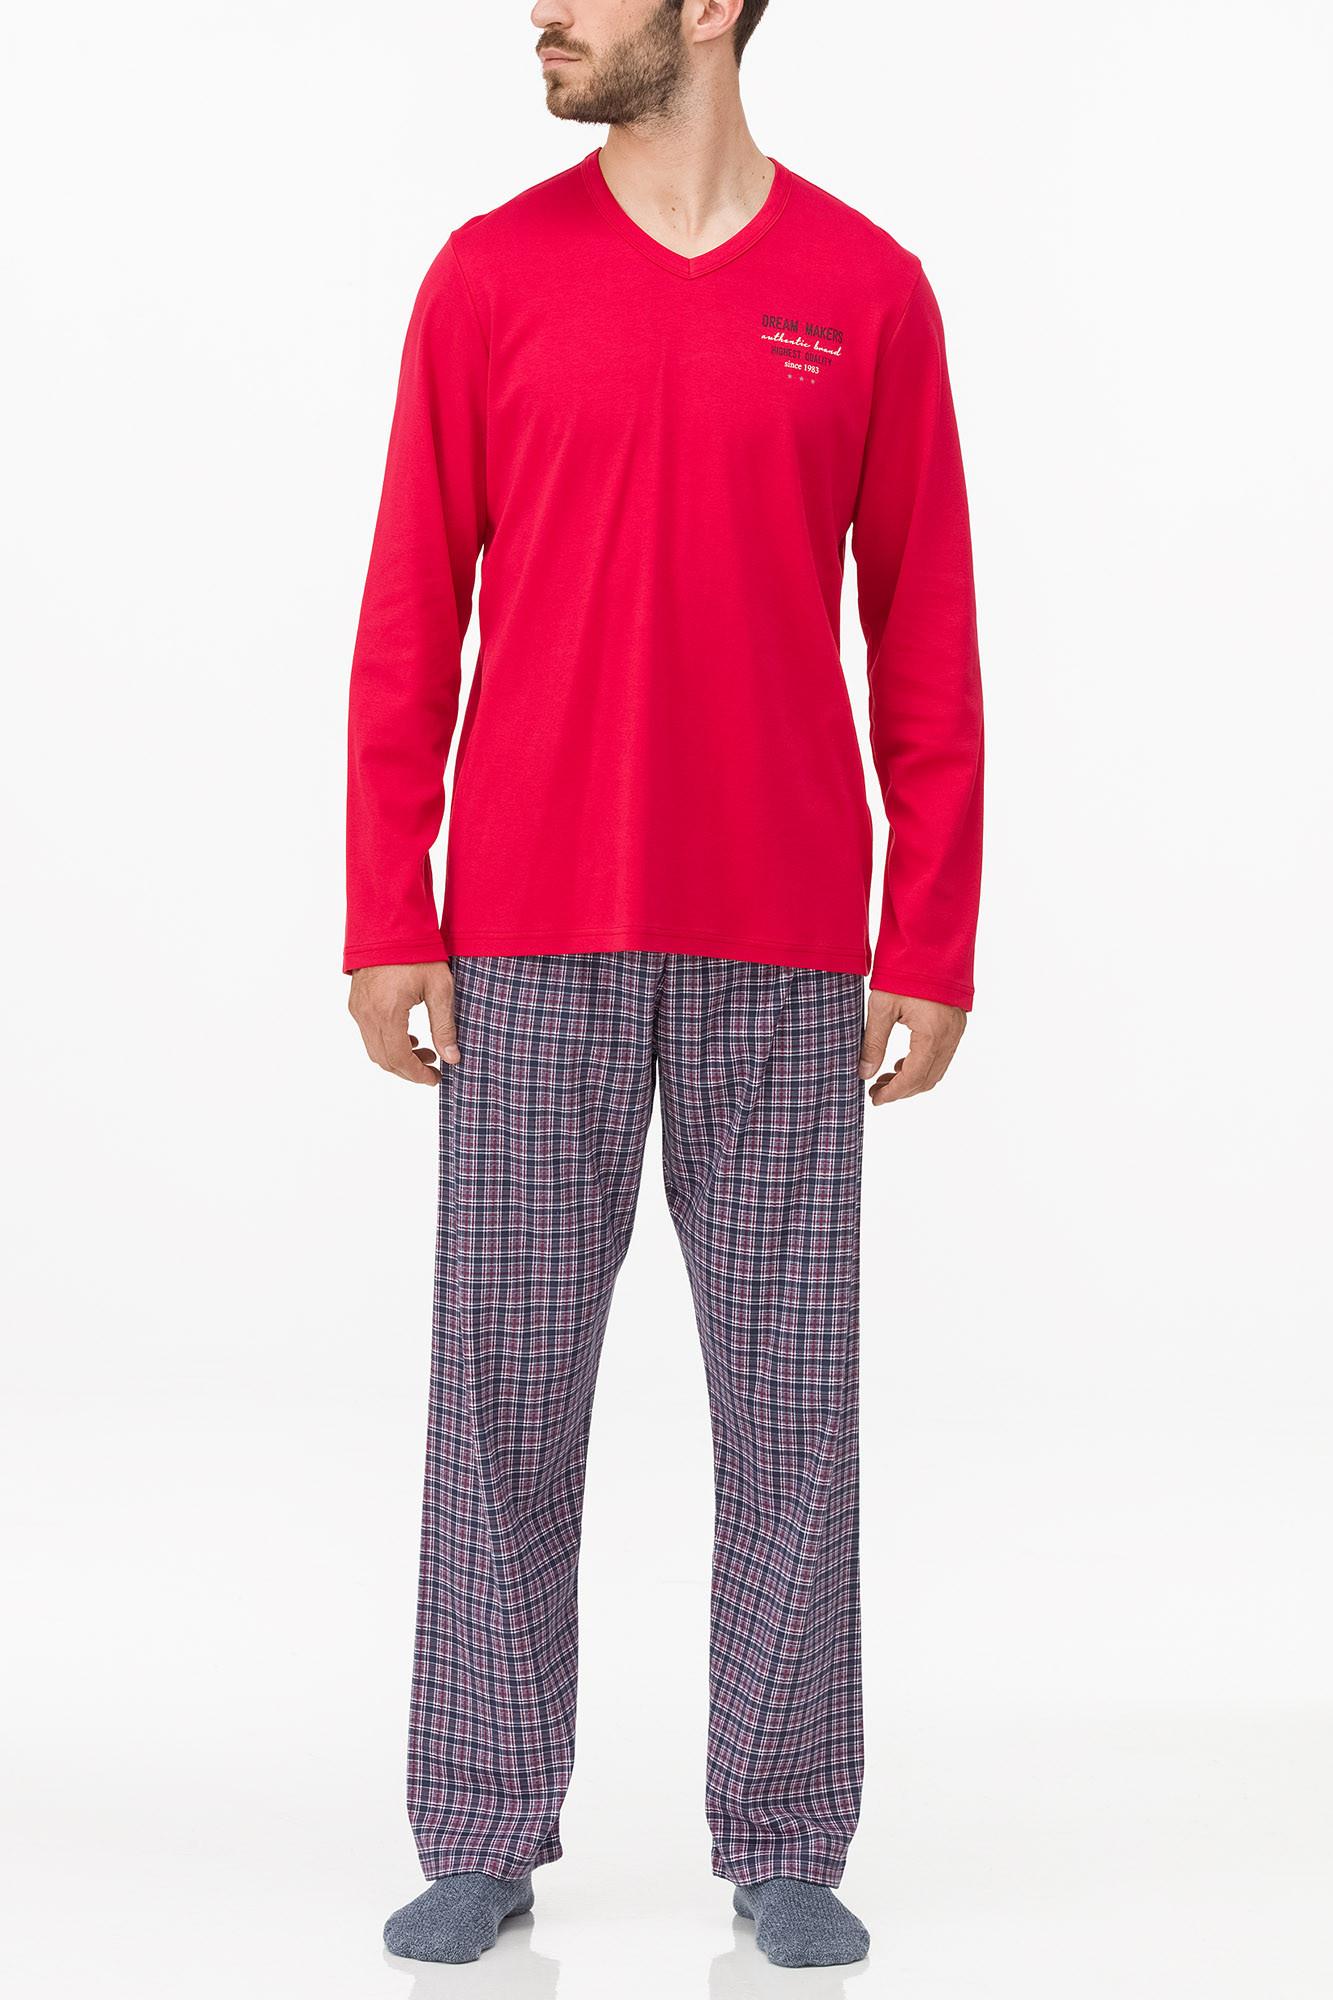 Vamp - Pánske pohodlné pyžamo 11698 - Vamp blue 5XL